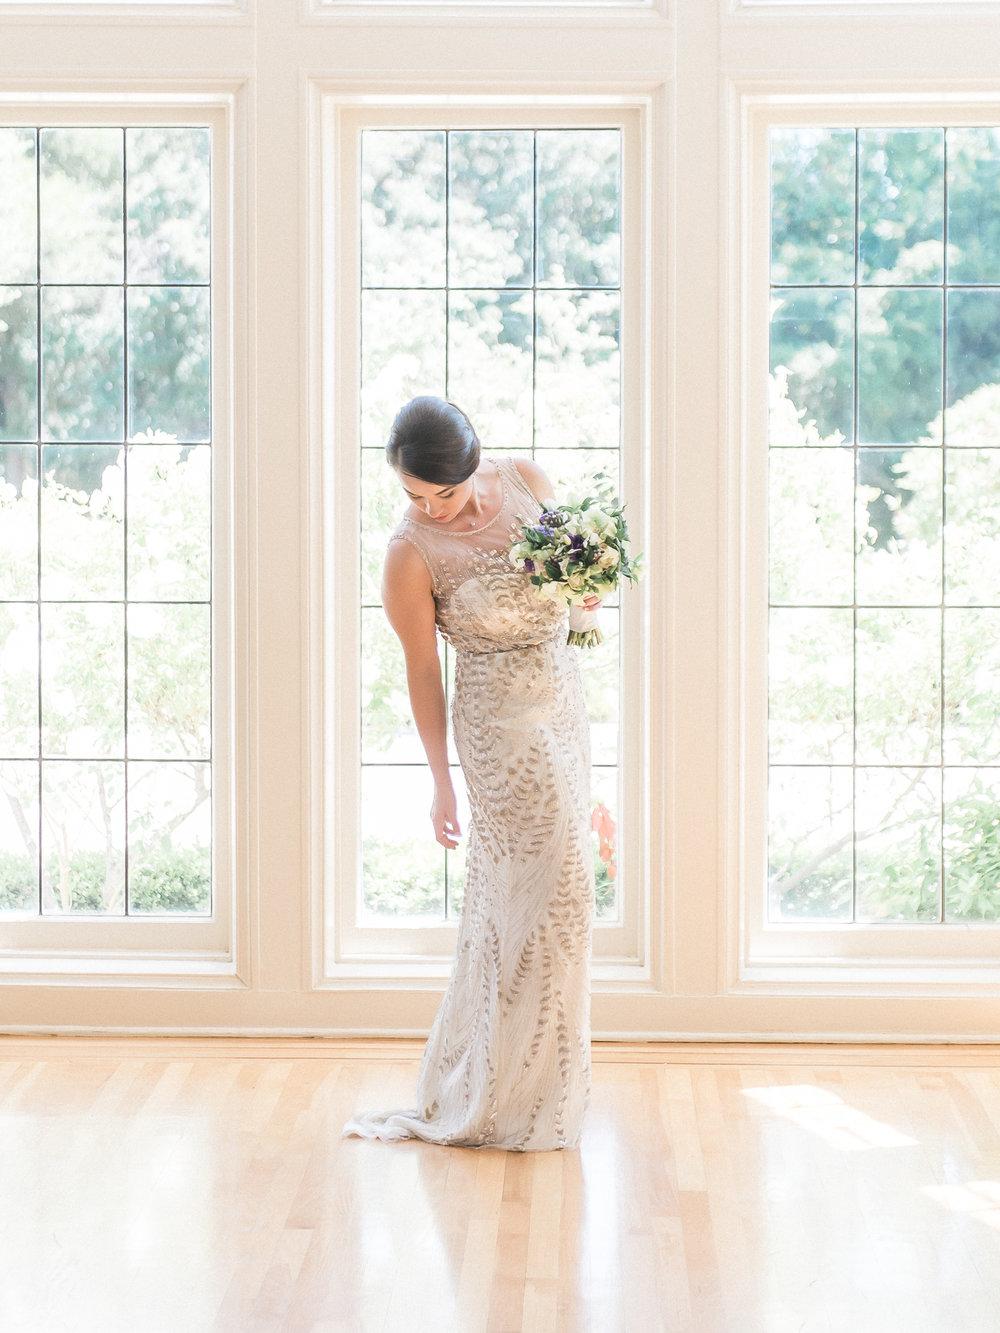 Sarah+Warren_wedding_spp-28.jpg